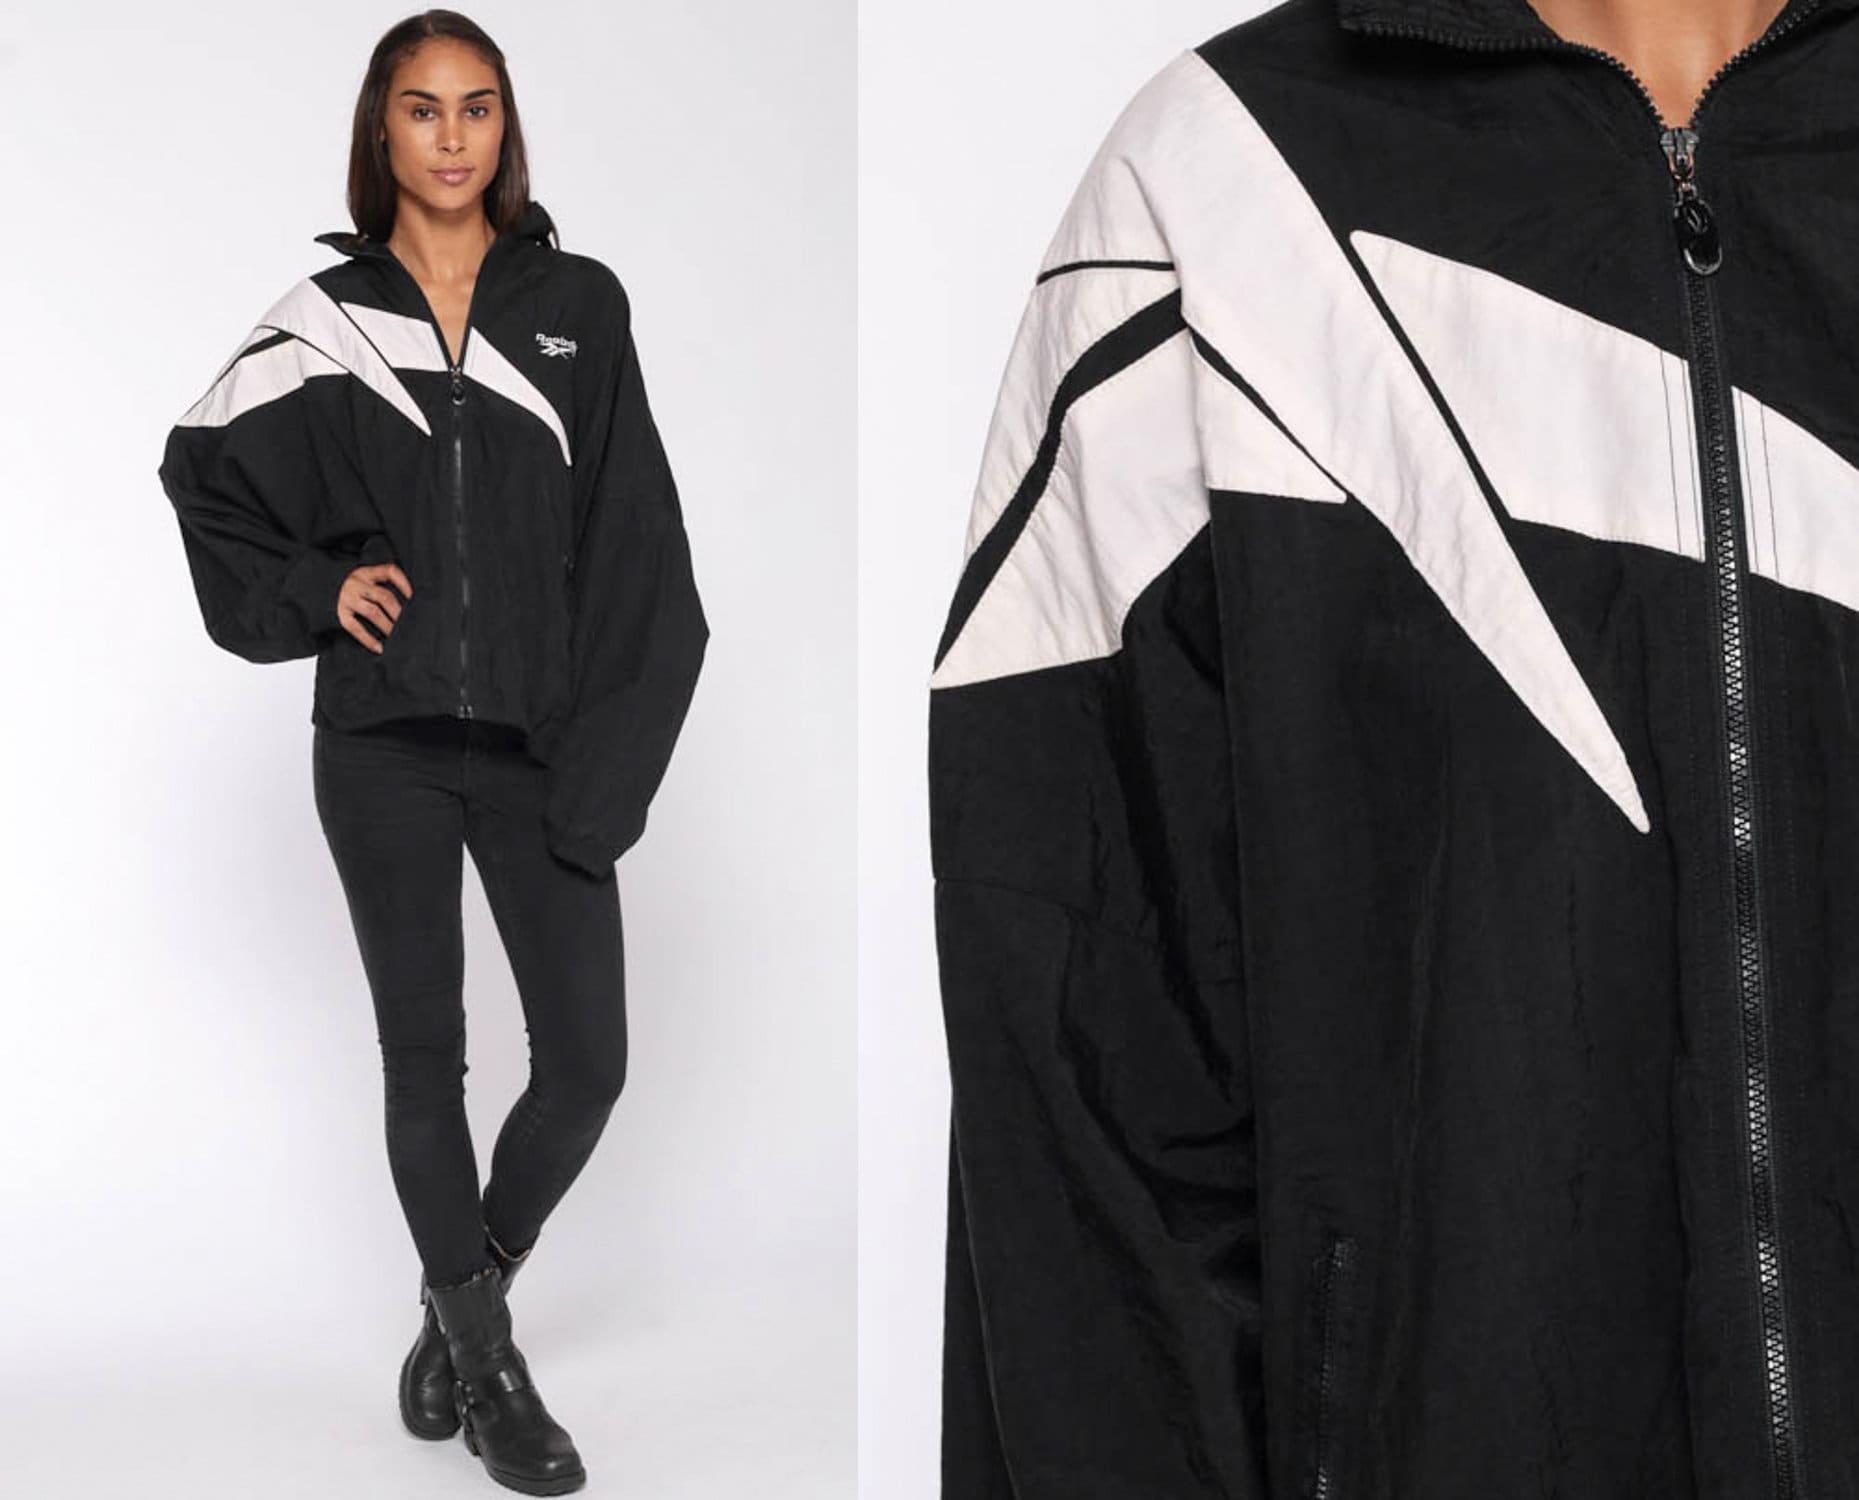 90s Clothing Streetwear 90s Reebok London England Color Block Spring Track Jacket 1990s Vintage RARE Reebok Windbreaker Coat  Jacket